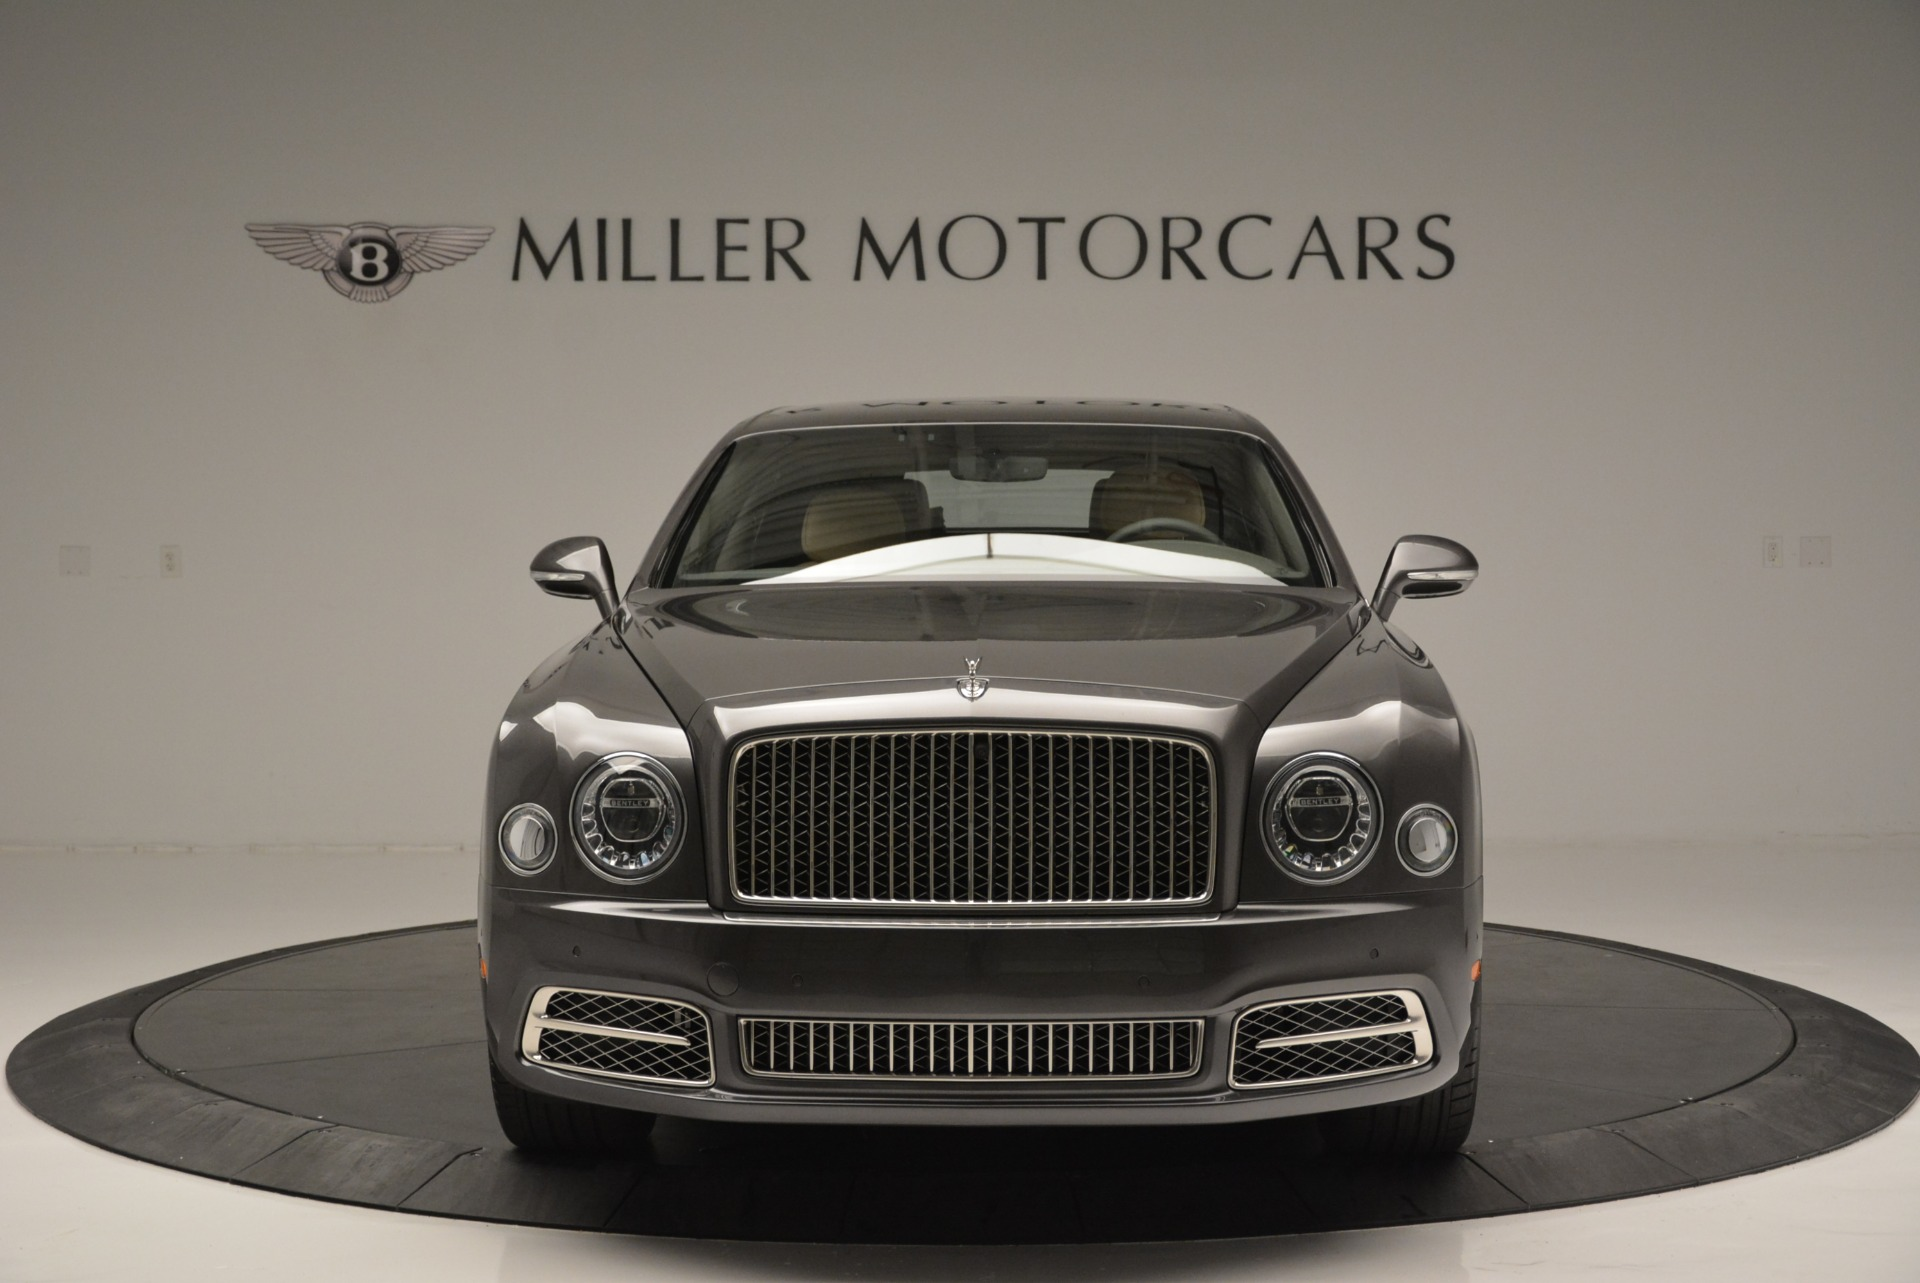 Used 2017 Bentley Mulsanne EWB For Sale In Greenwich, CT 1554_p2